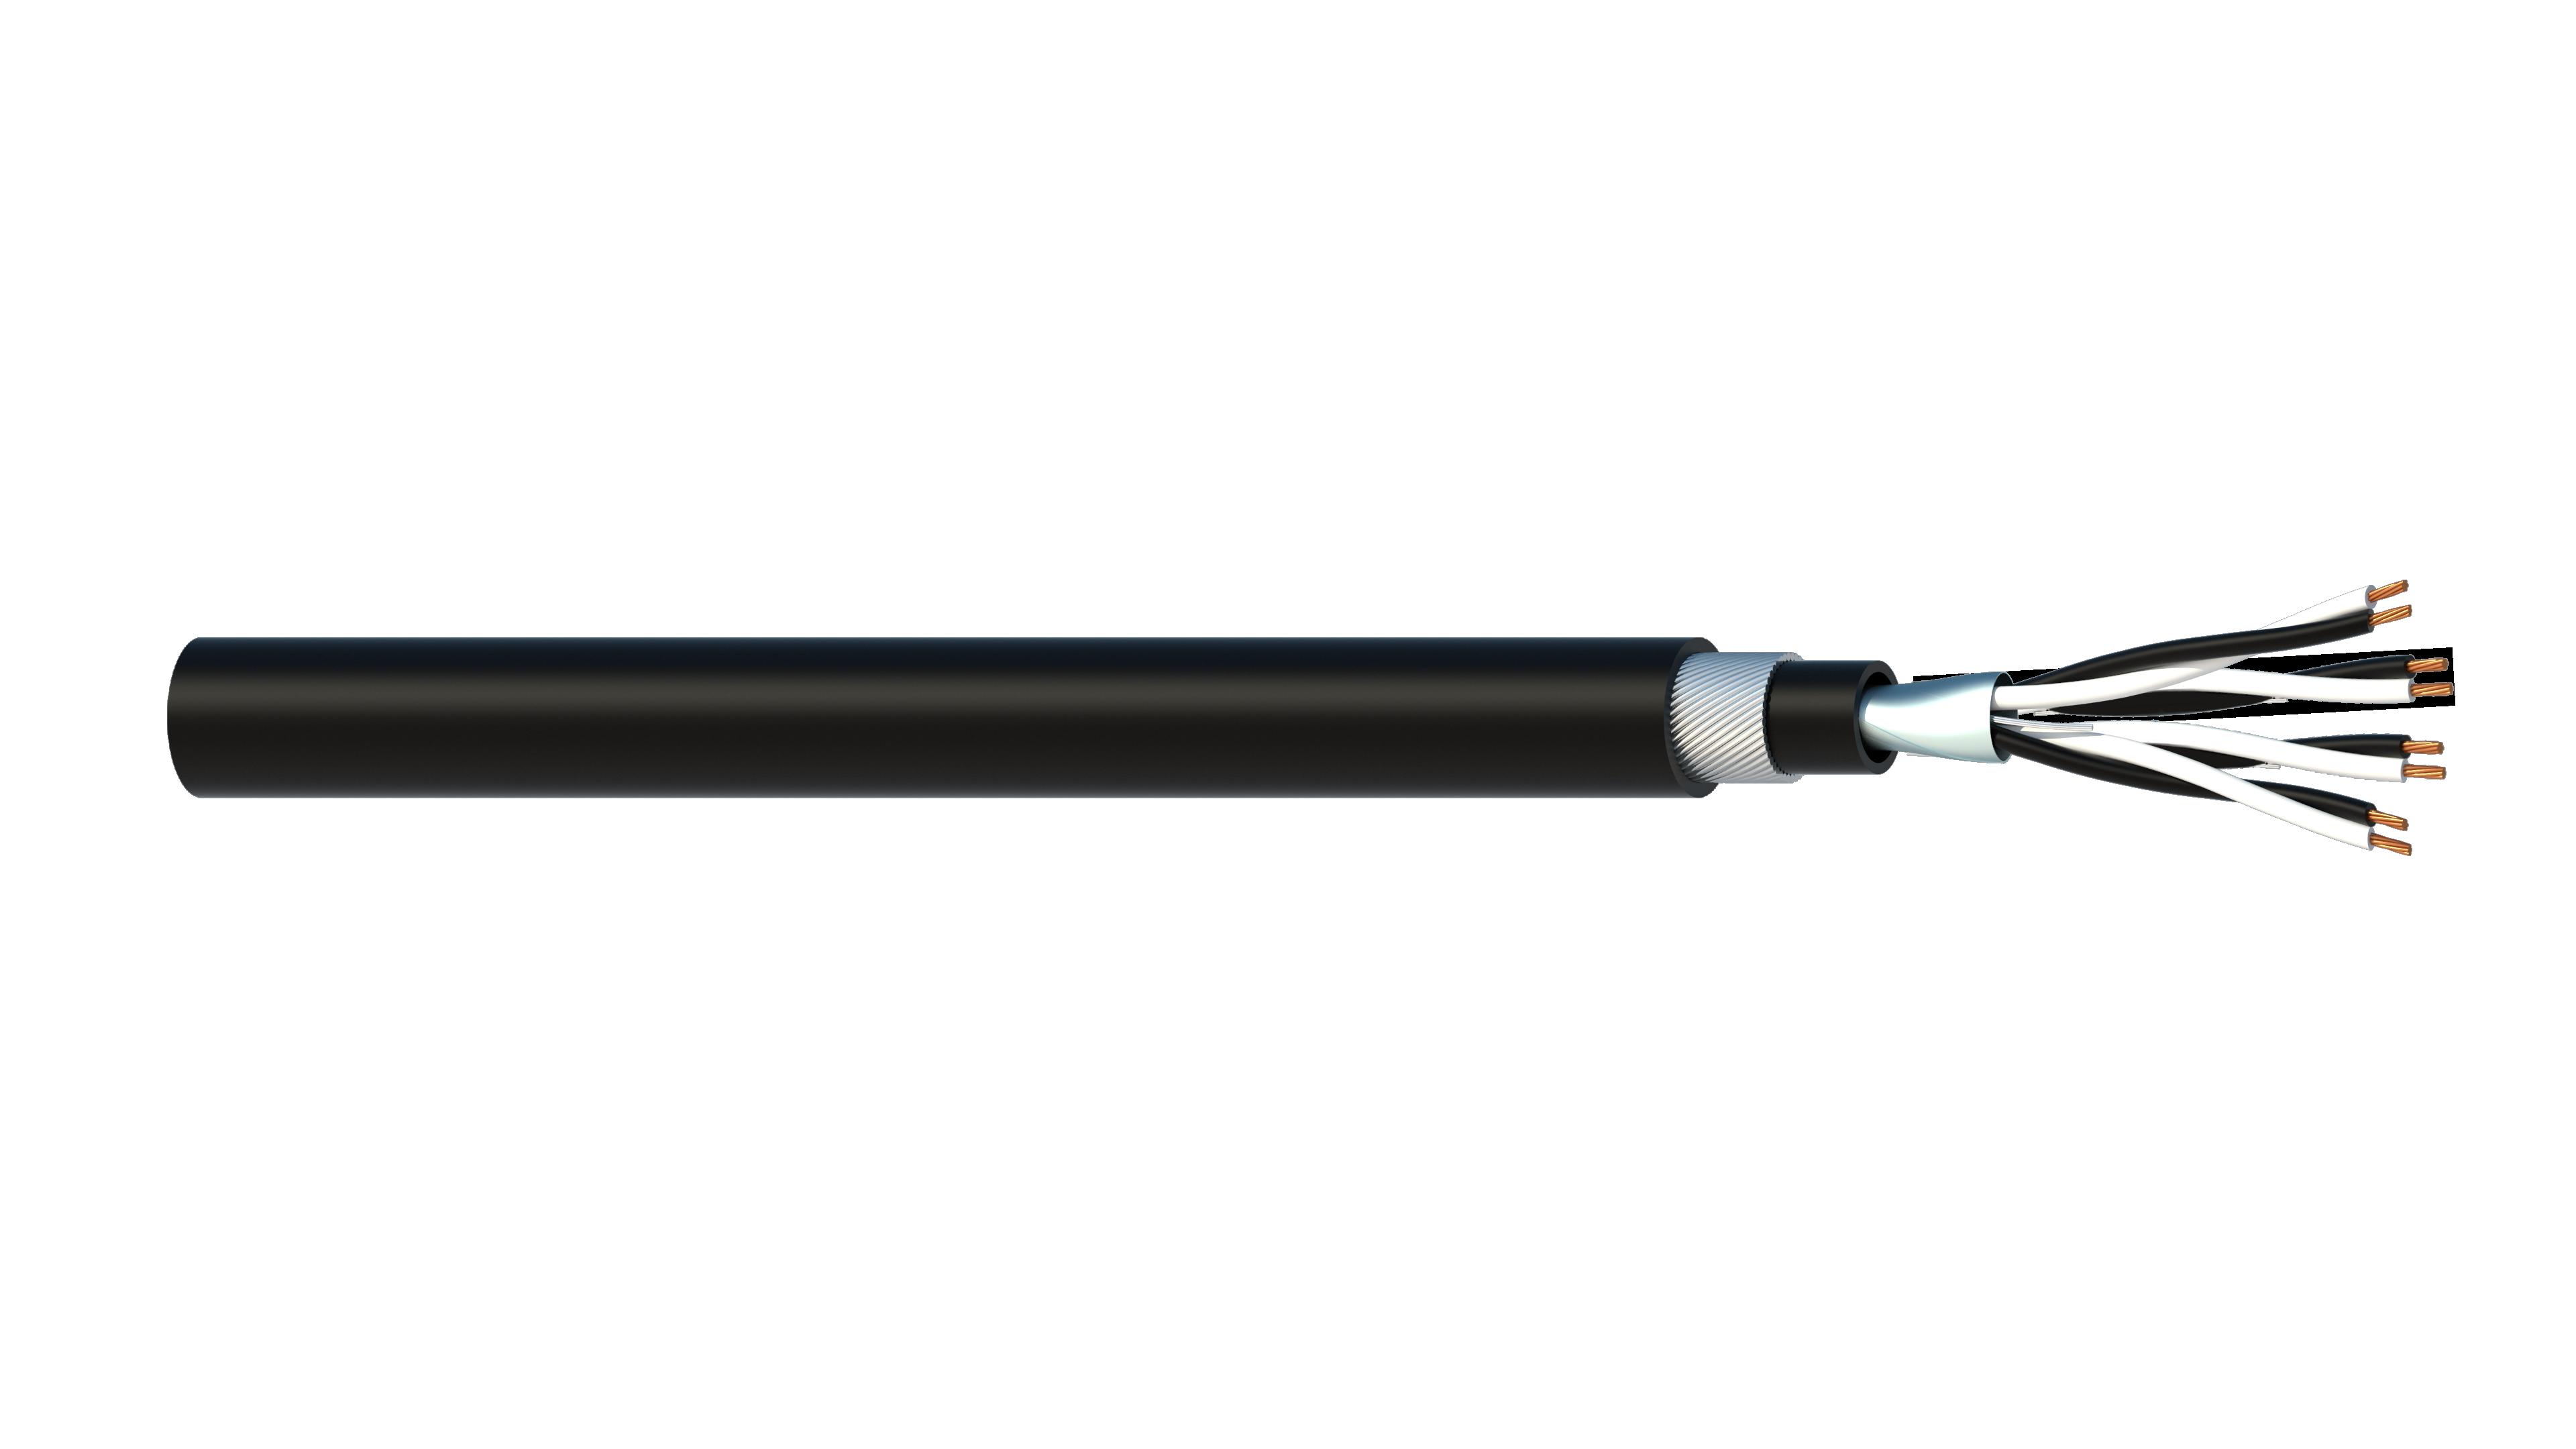 4 Pair 1.5mm2 Cu/PVC/OS/PVC/SWA/PVC Maser Instrumentation Cable - Black Sheath